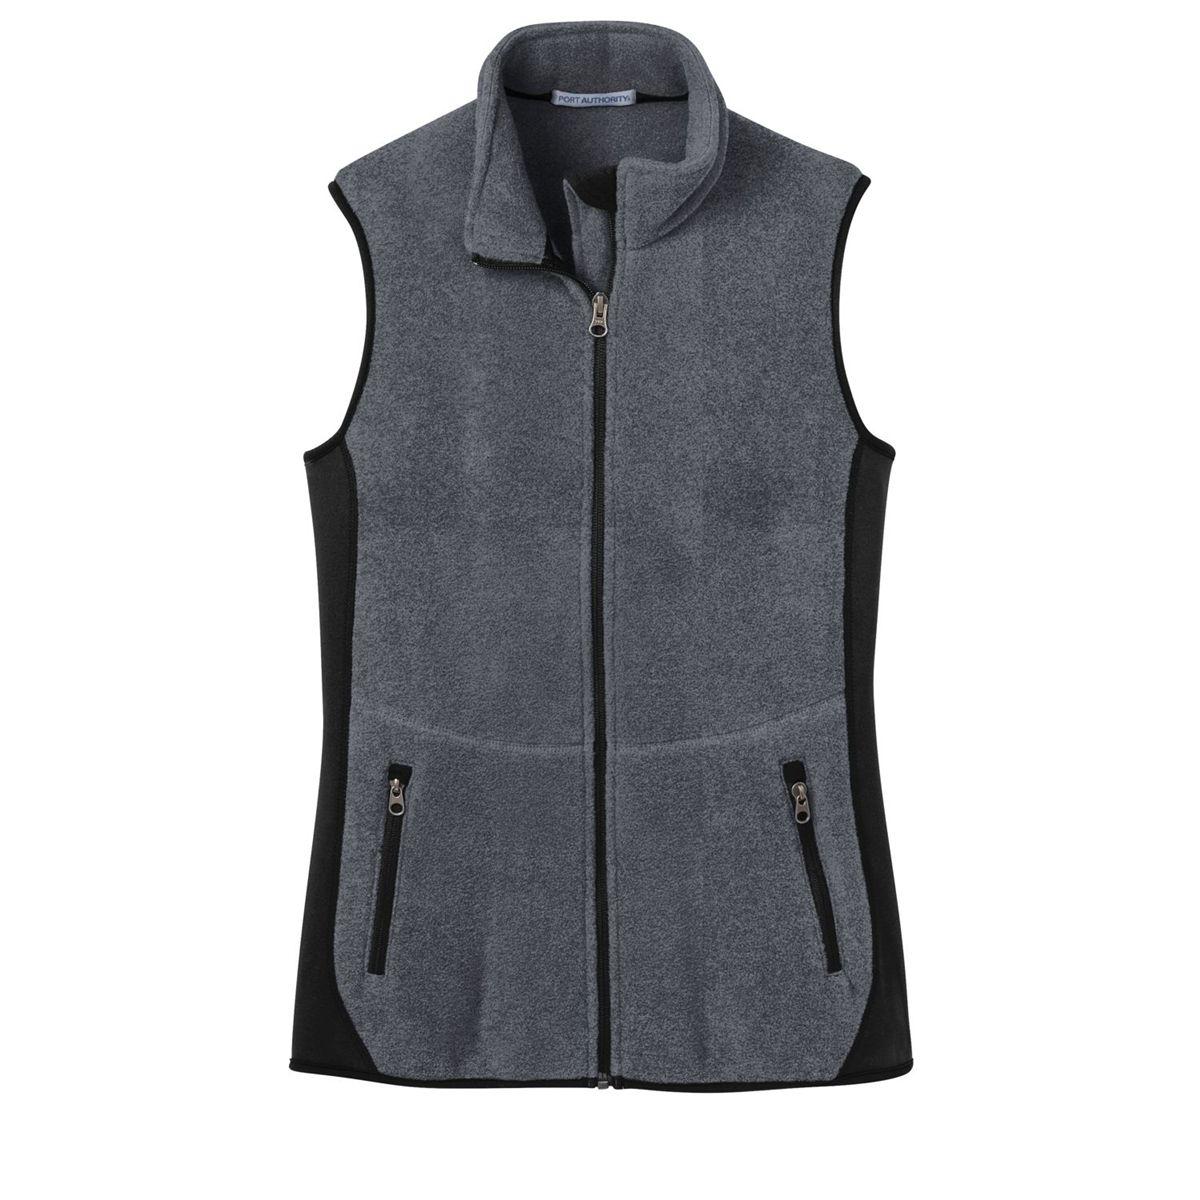 1449be1b86f Port Authority Women s Navy SuperPro Oxford Shirt